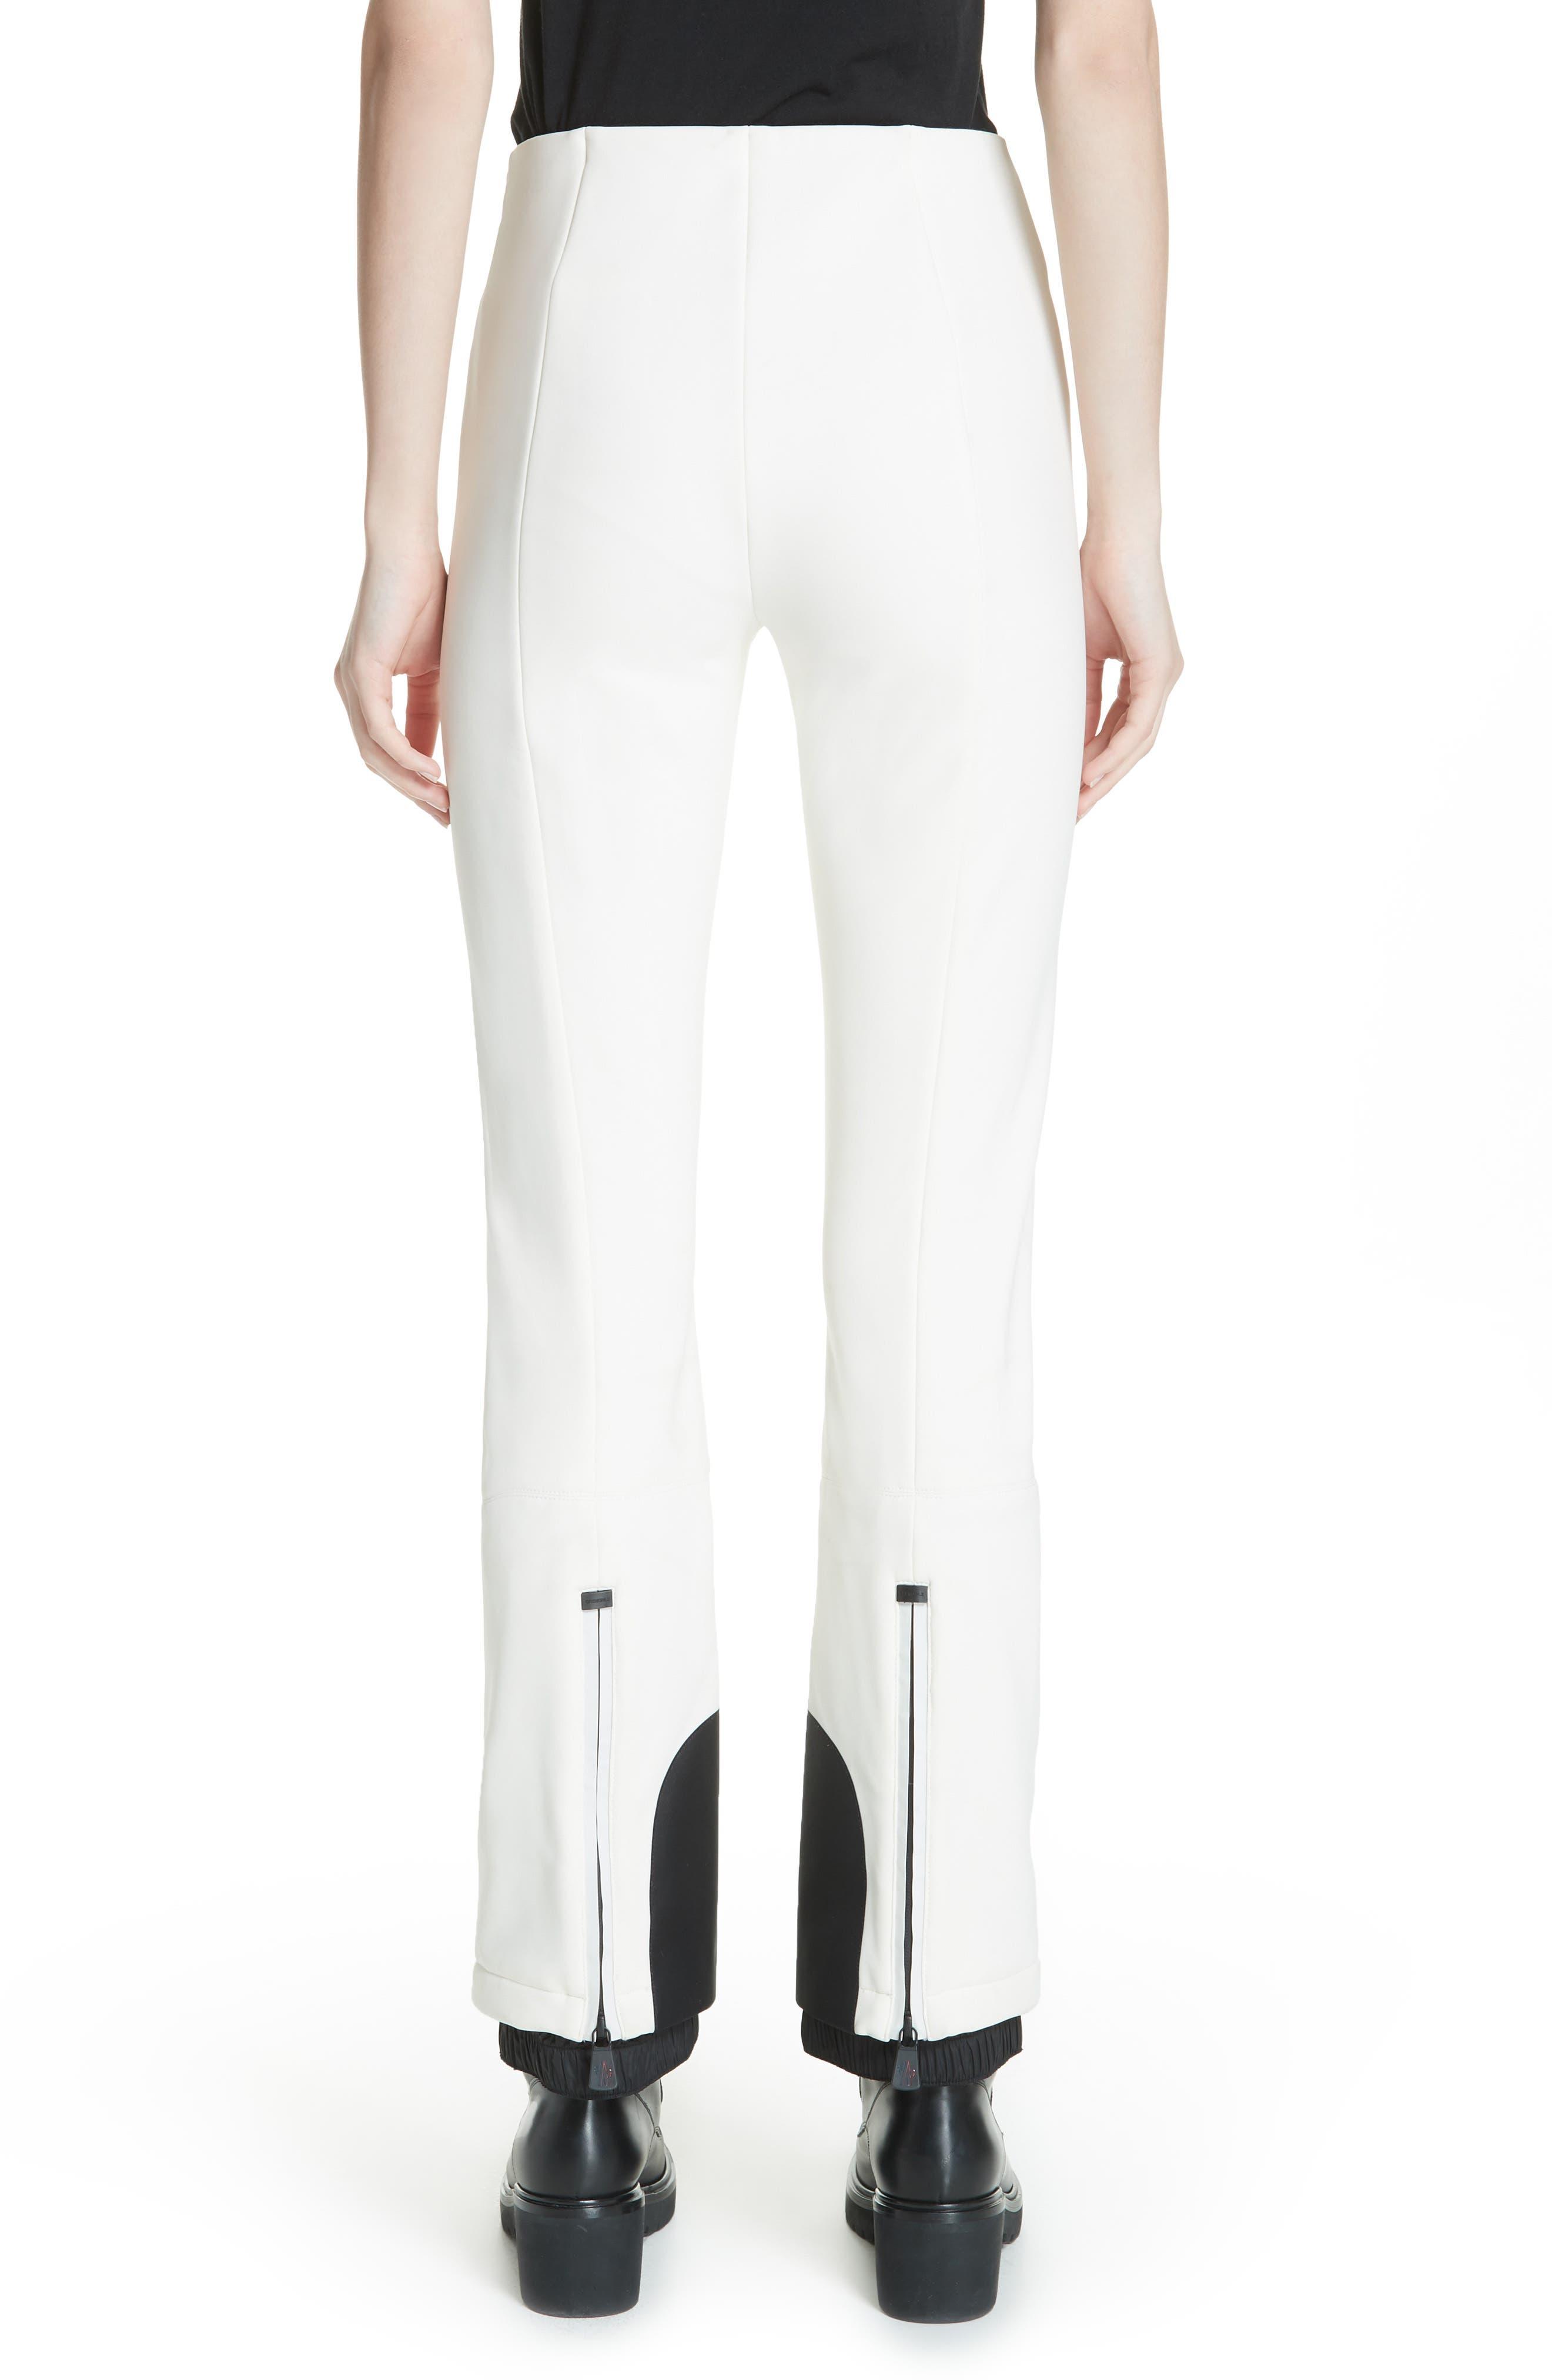 MONCLER, Skinny Stretch Ski Pants, Alternate thumbnail 2, color, WHITE